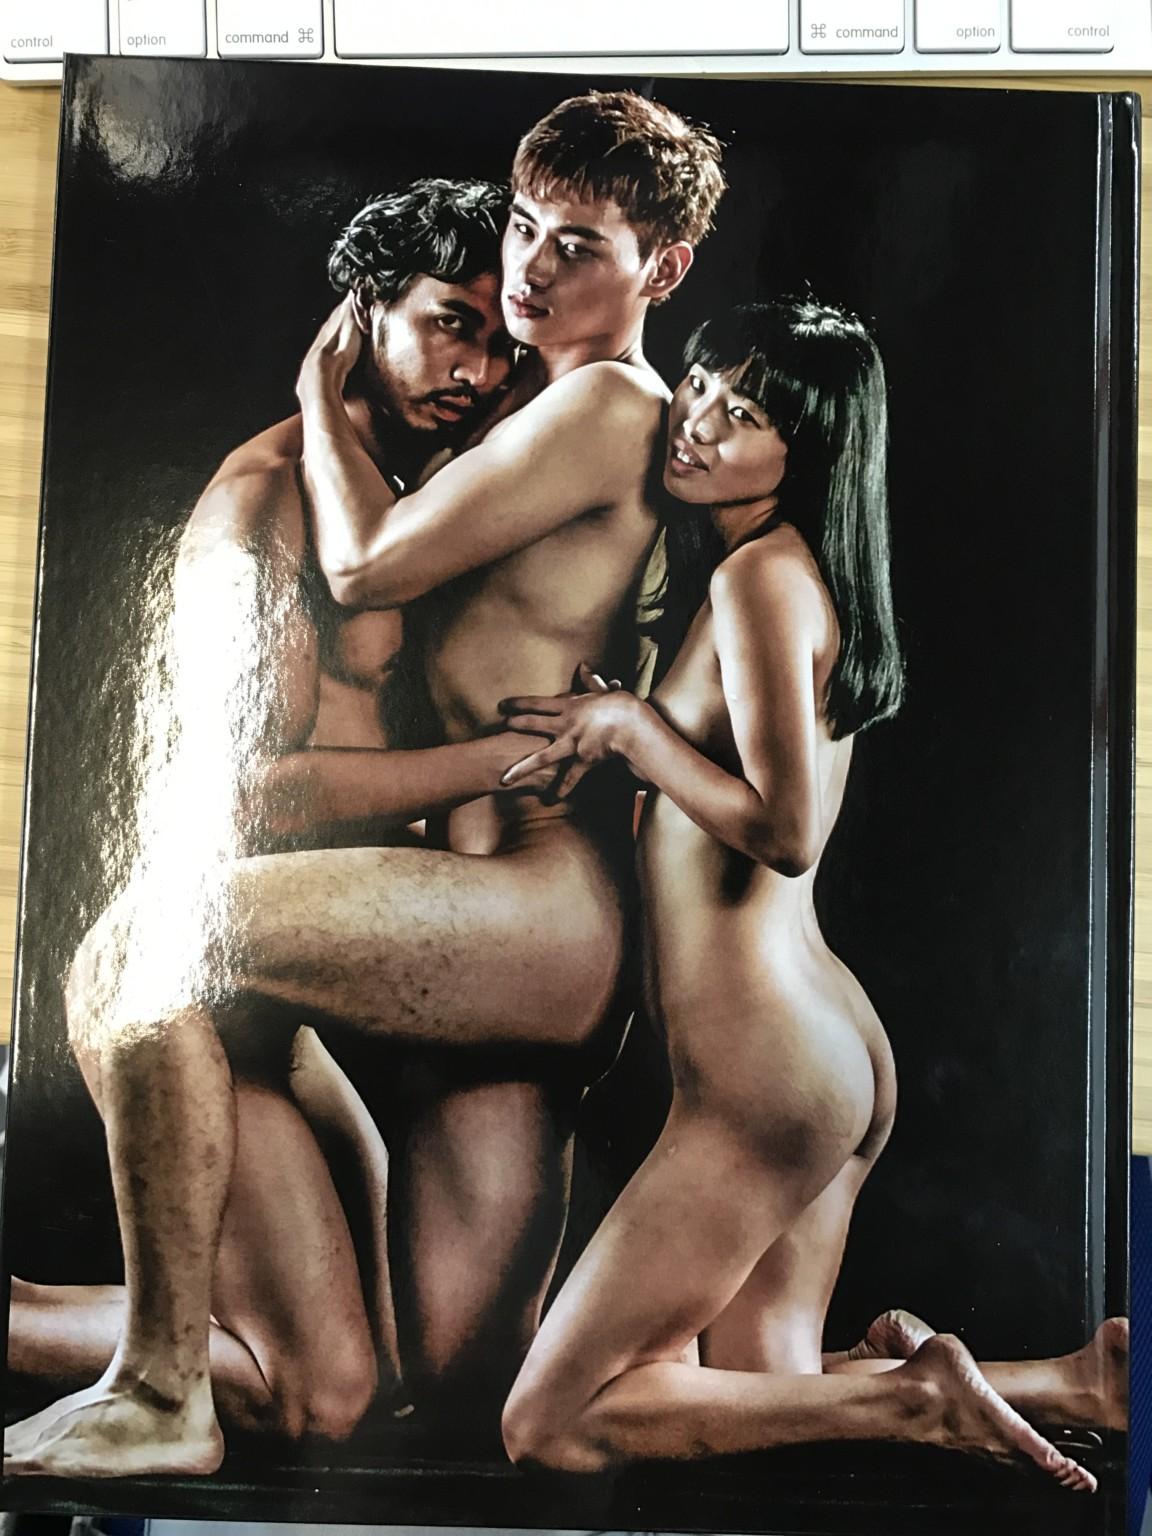 Poker sex en la mansion de nacho vidal - 2 part 6